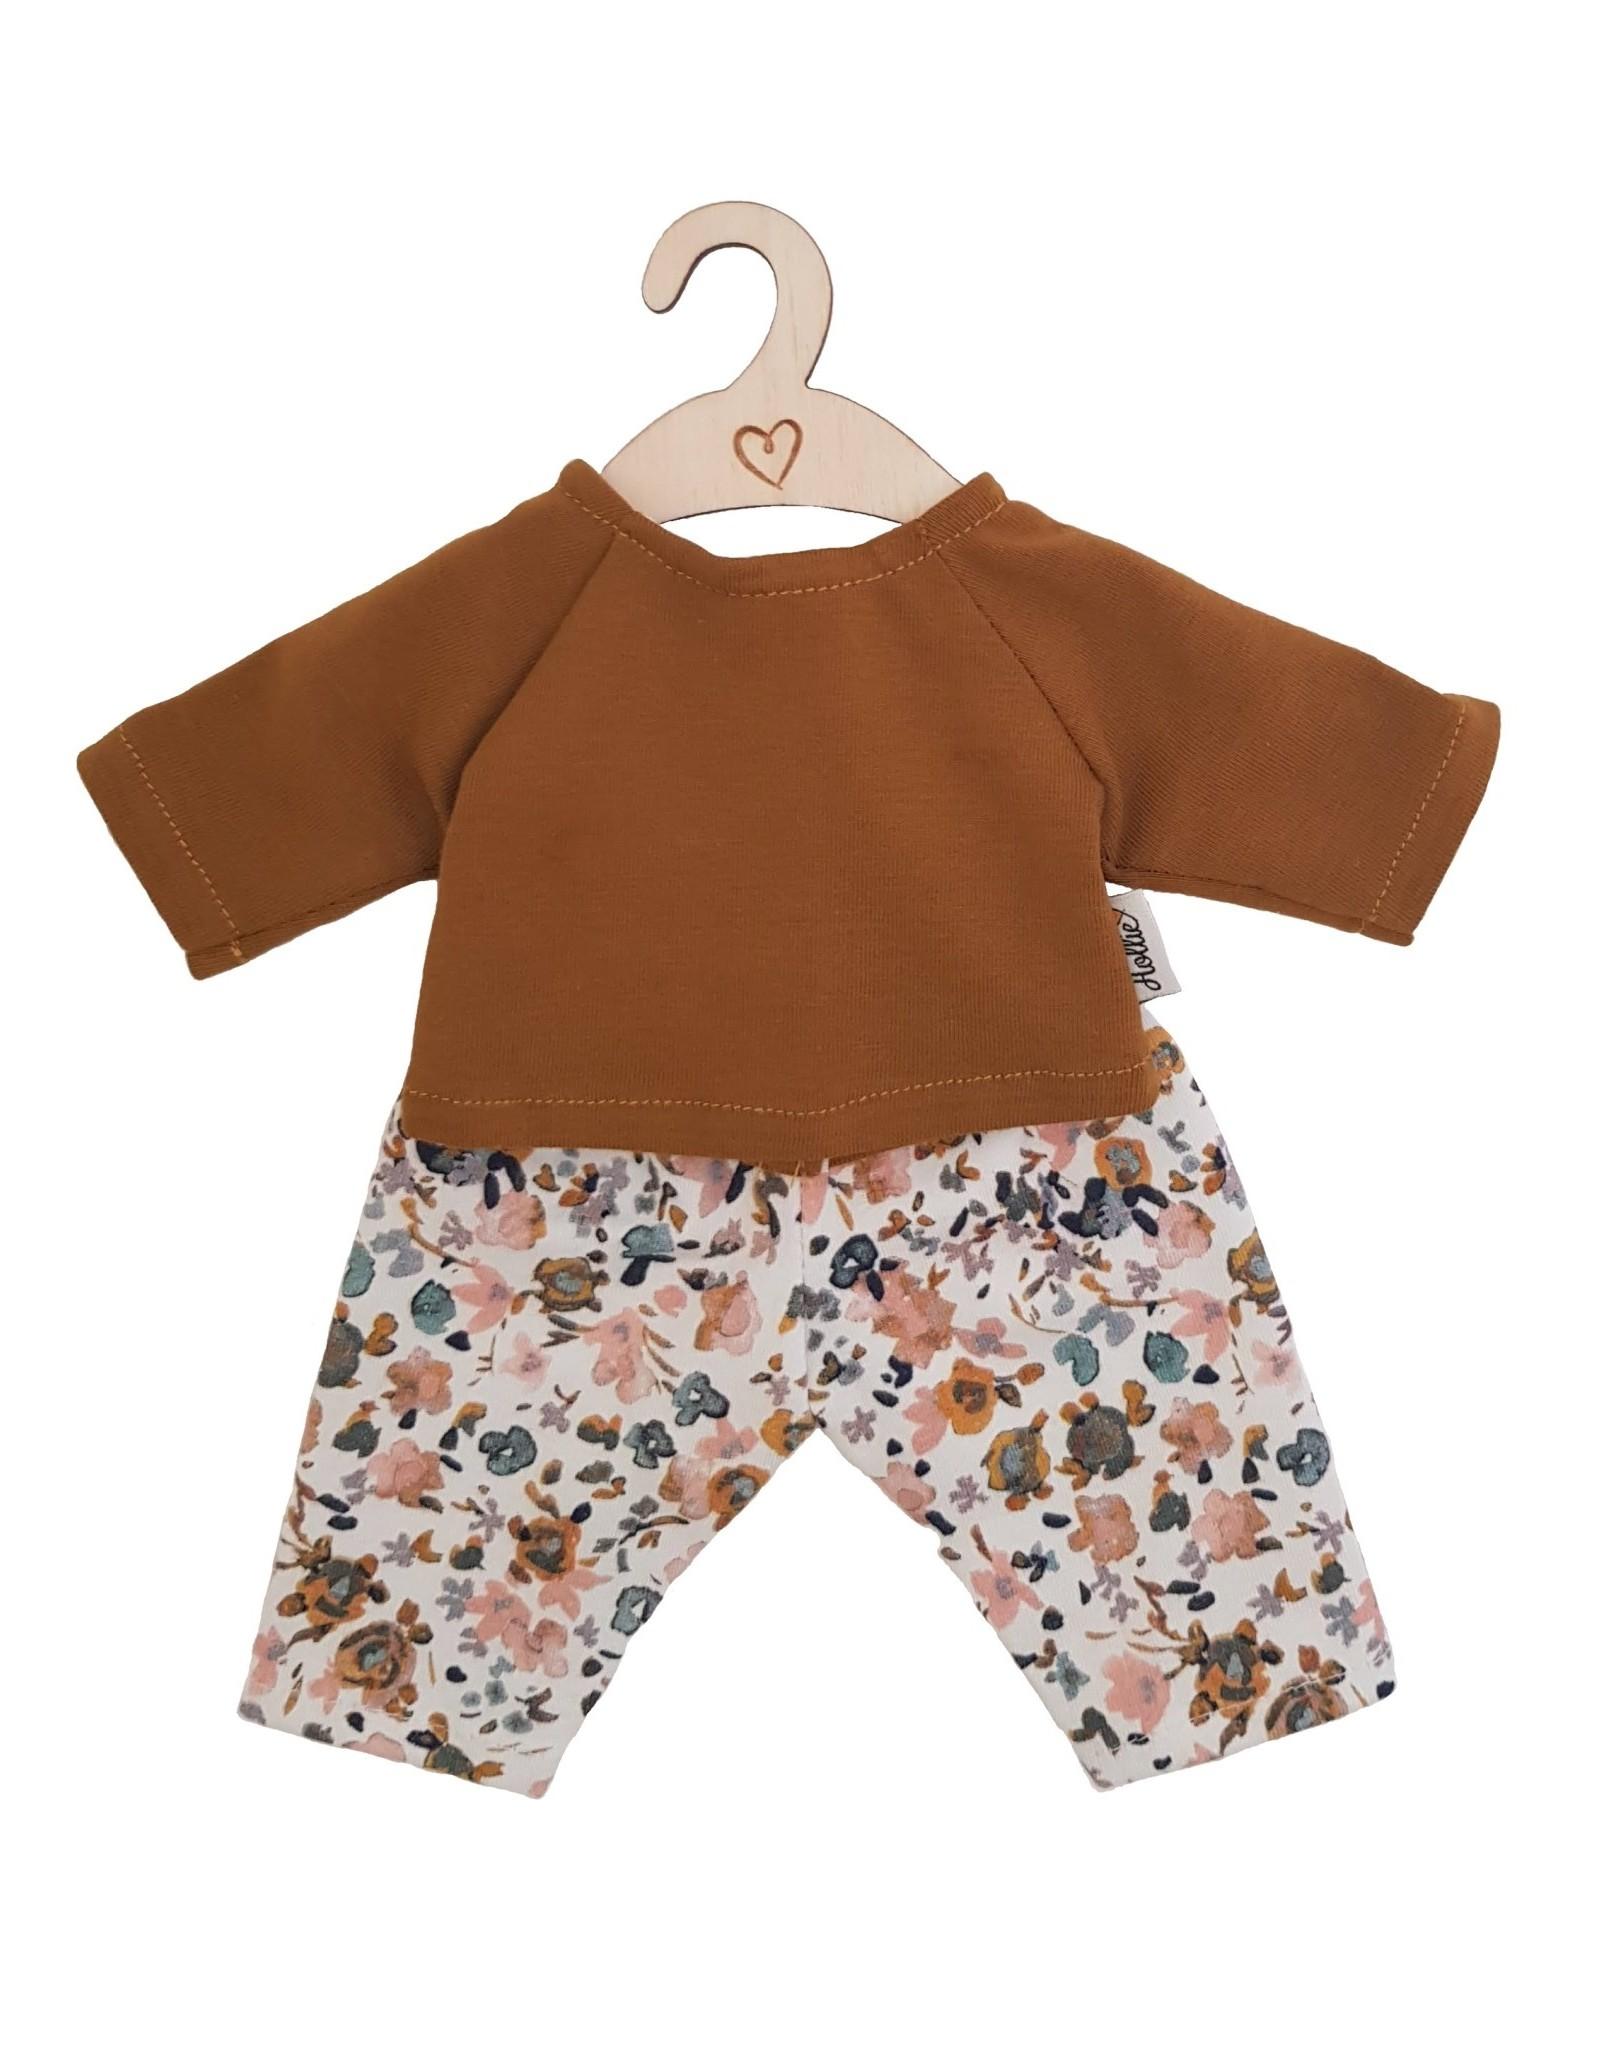 Hollie Hollie poppenbroek en shirt Poppy